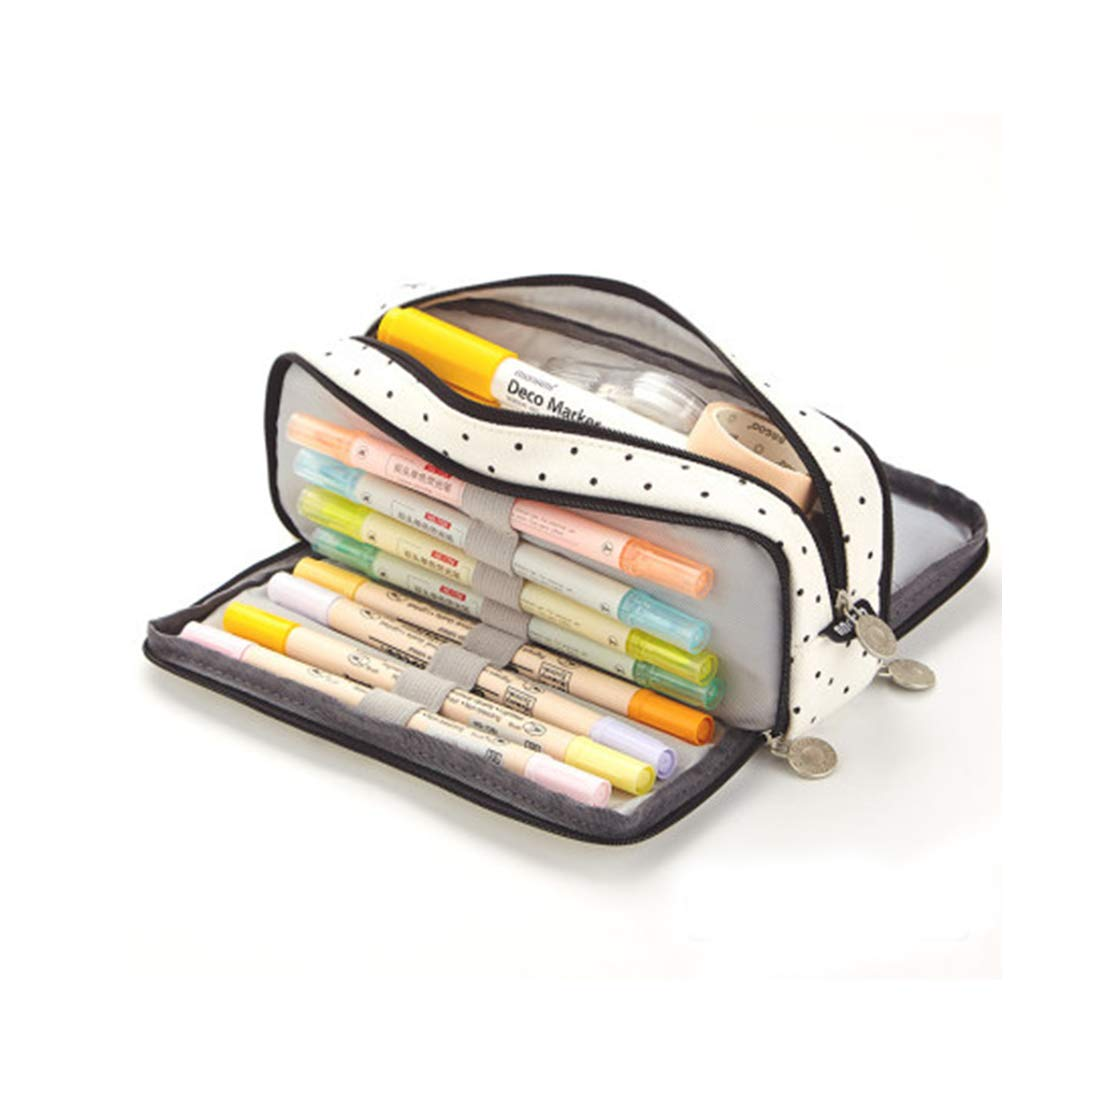 Oyachic Triple Zipper Pen Case Multi Compartments Pencil Case 3 Zippers Pen Bag Pouch Holder Square Grid Cosmetic Bags Organizer Stationery Box (Black Plaid)